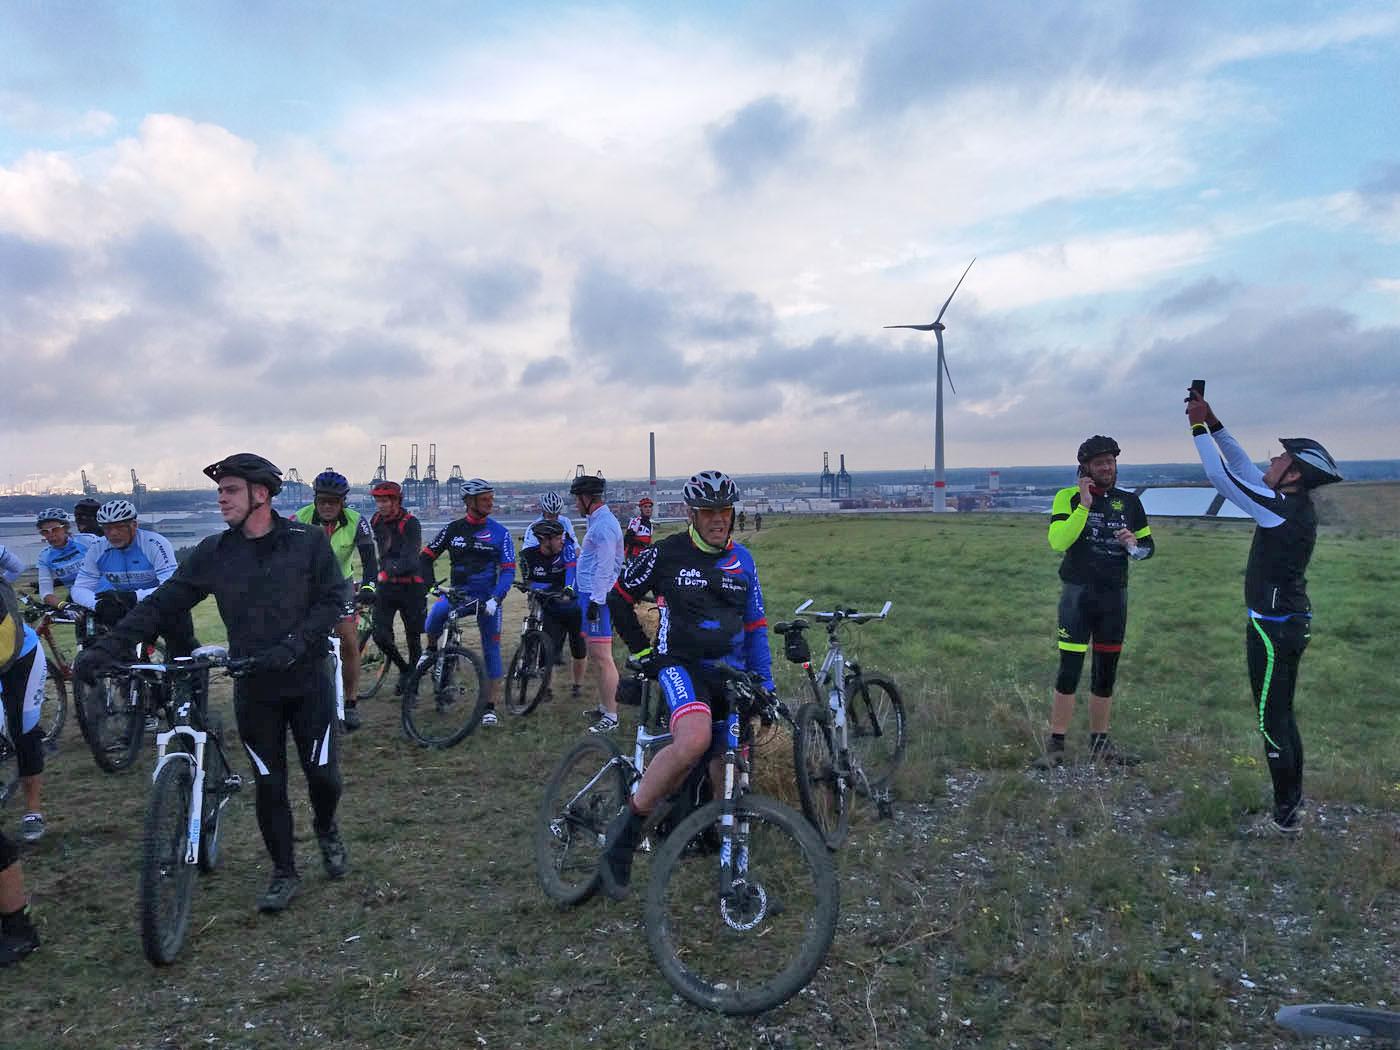 mountainbike2016-10-02-09.11.33